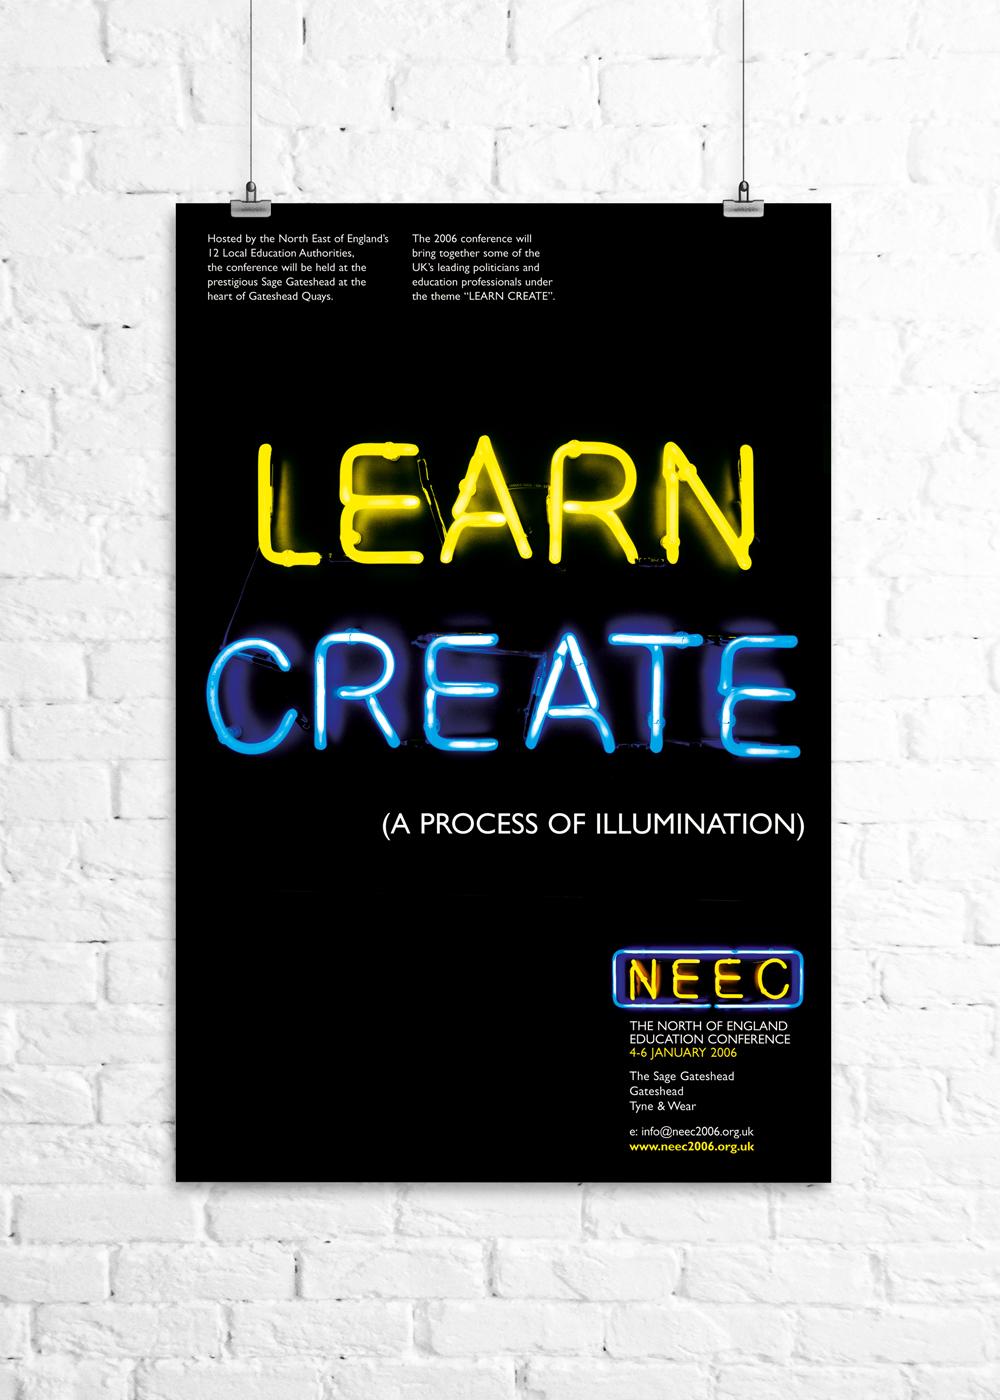 NEEC marketing poster